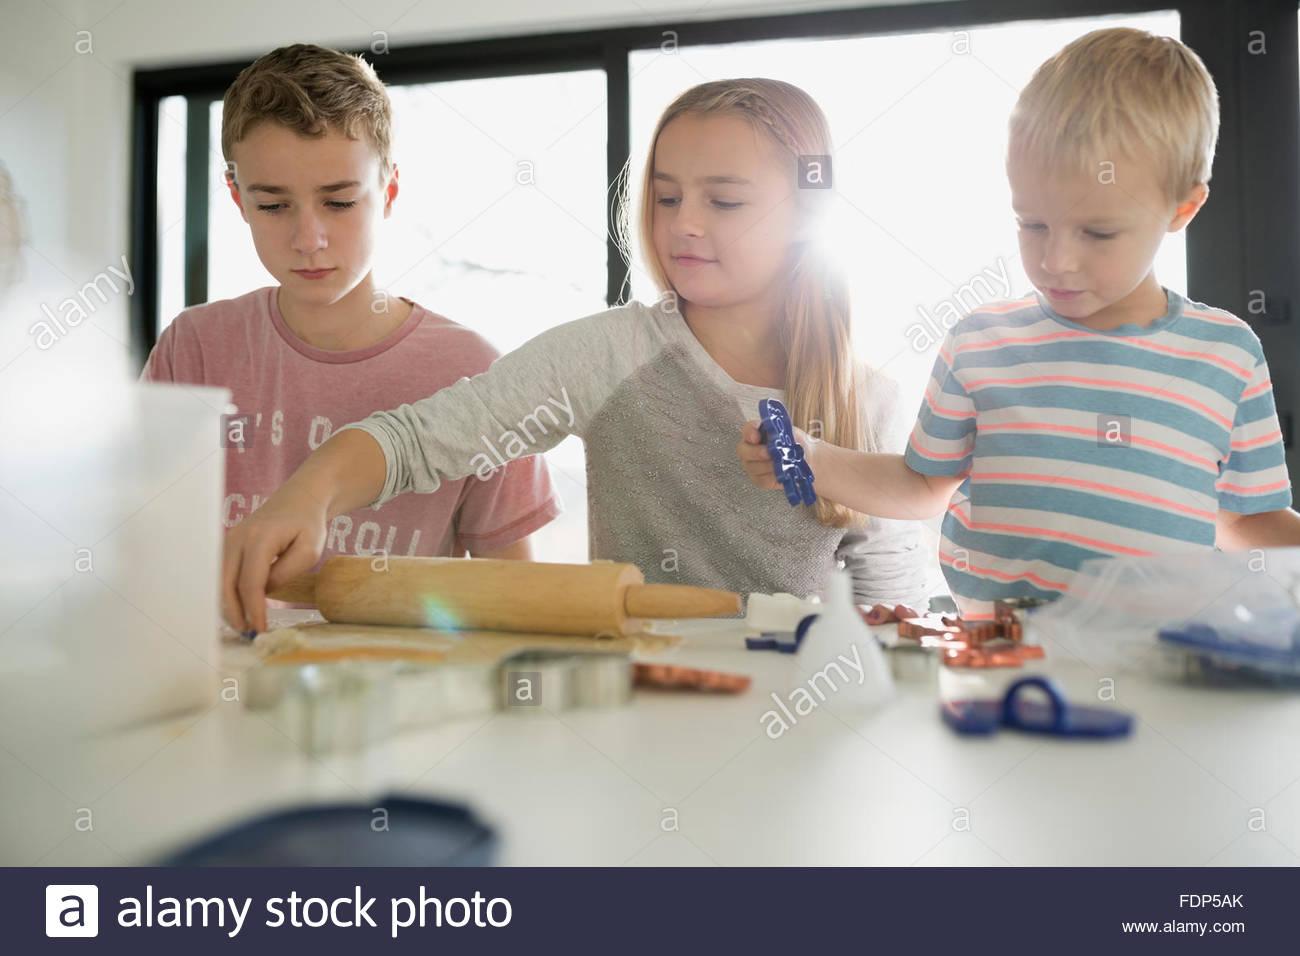 Frères et soeur baking cookies Photo Stock